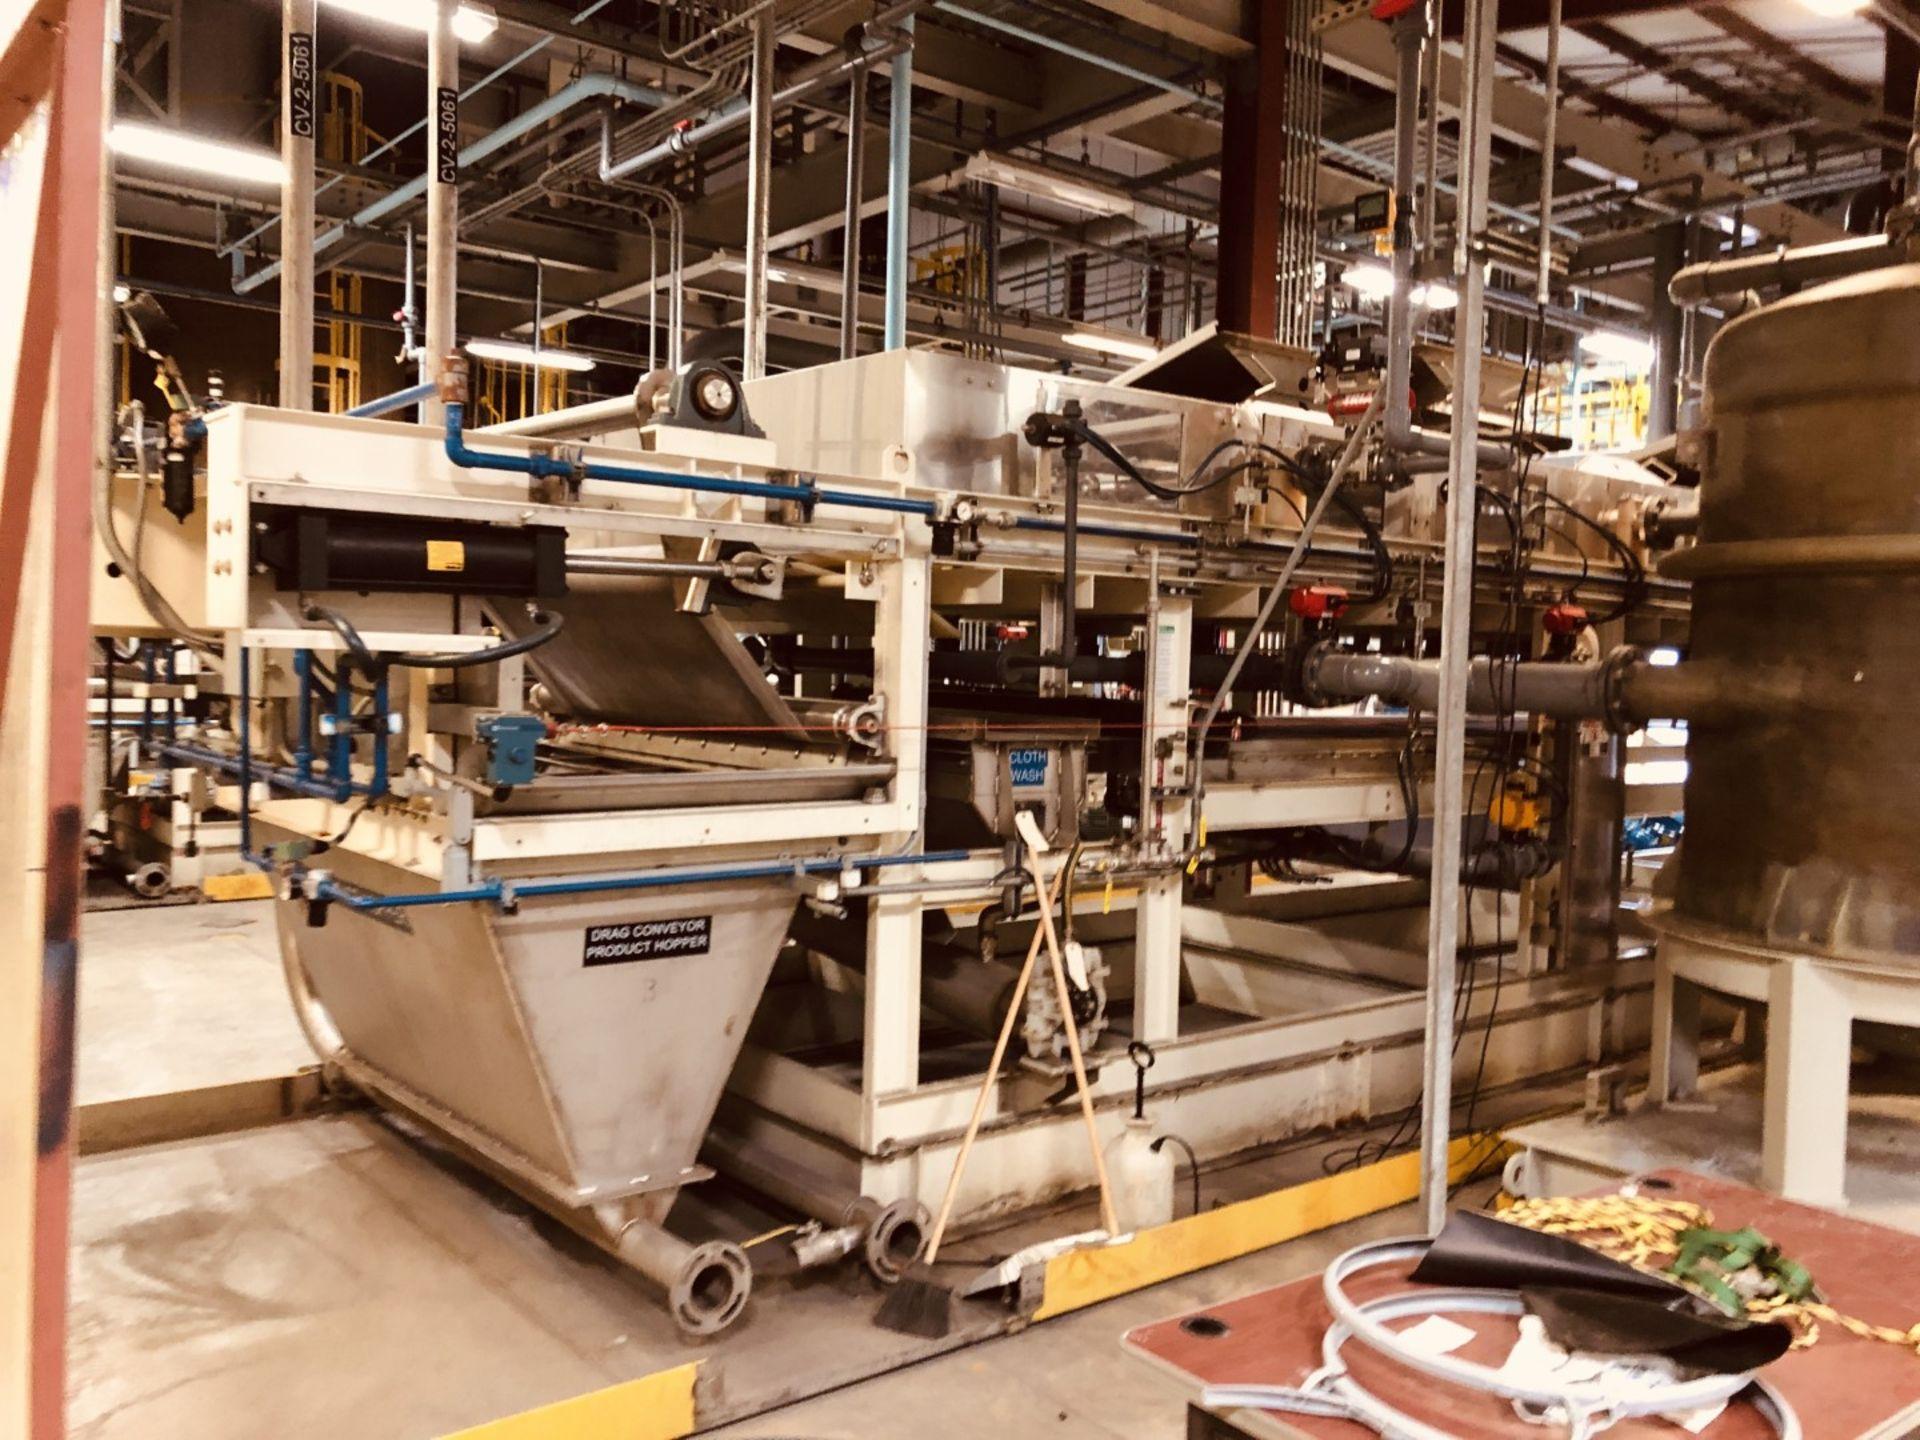 Komline Sanderson Model CIX HVF 1.25x9.75m 11.25 Sq Meter Horizontal Belt Vacuum Filter - Image 9 of 14